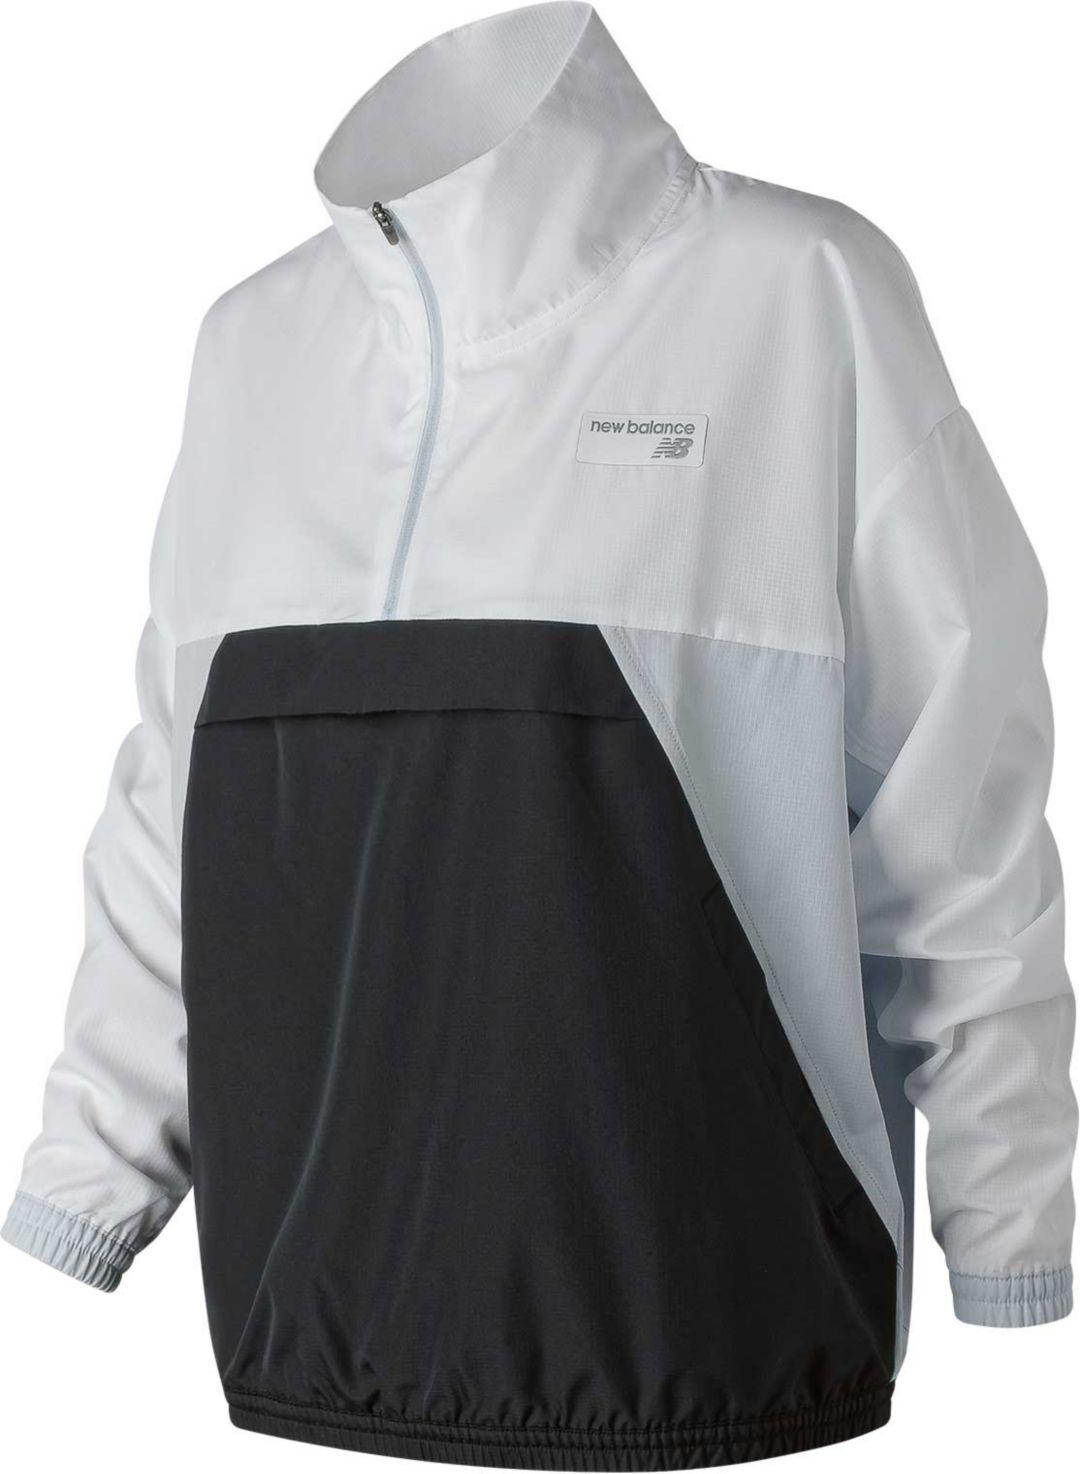 ee816218544e6 New Balance Women's Athletics Windbreaker Jacket | DICK'S Sporting Goods